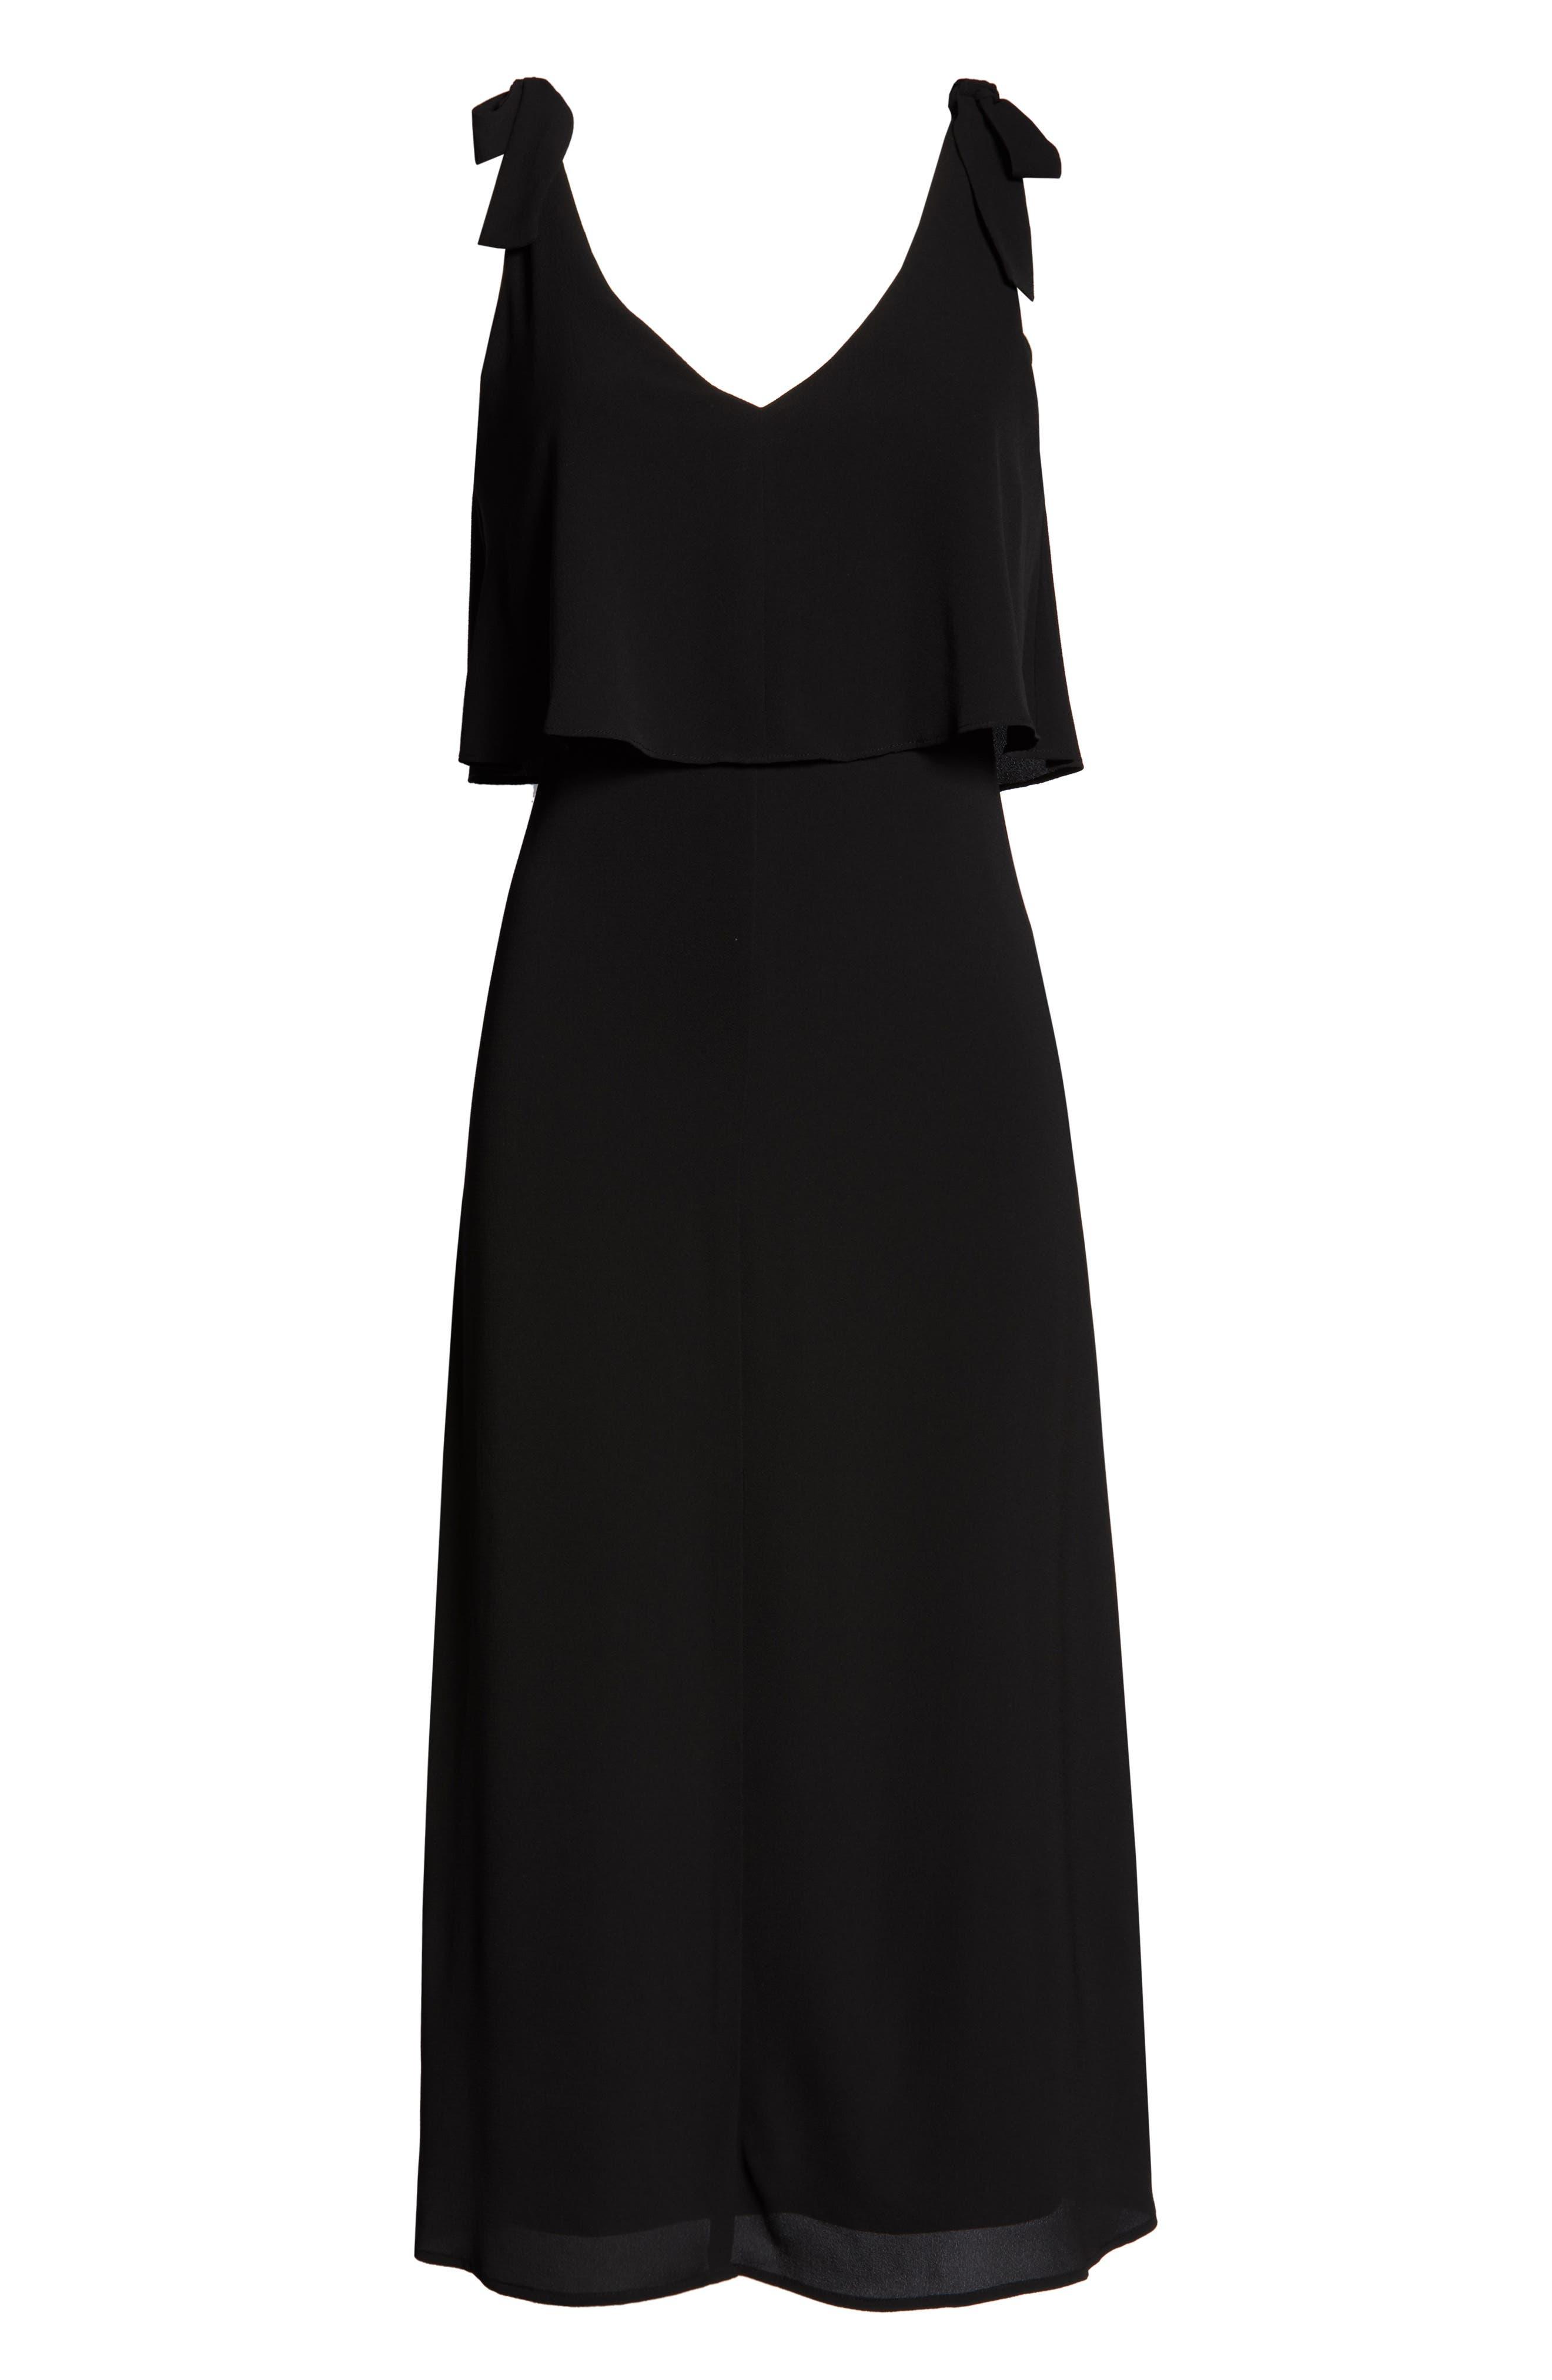 CHARLES HENRY, Tie Shoulder Popover Midi Dress, Alternate thumbnail 7, color, BLACK